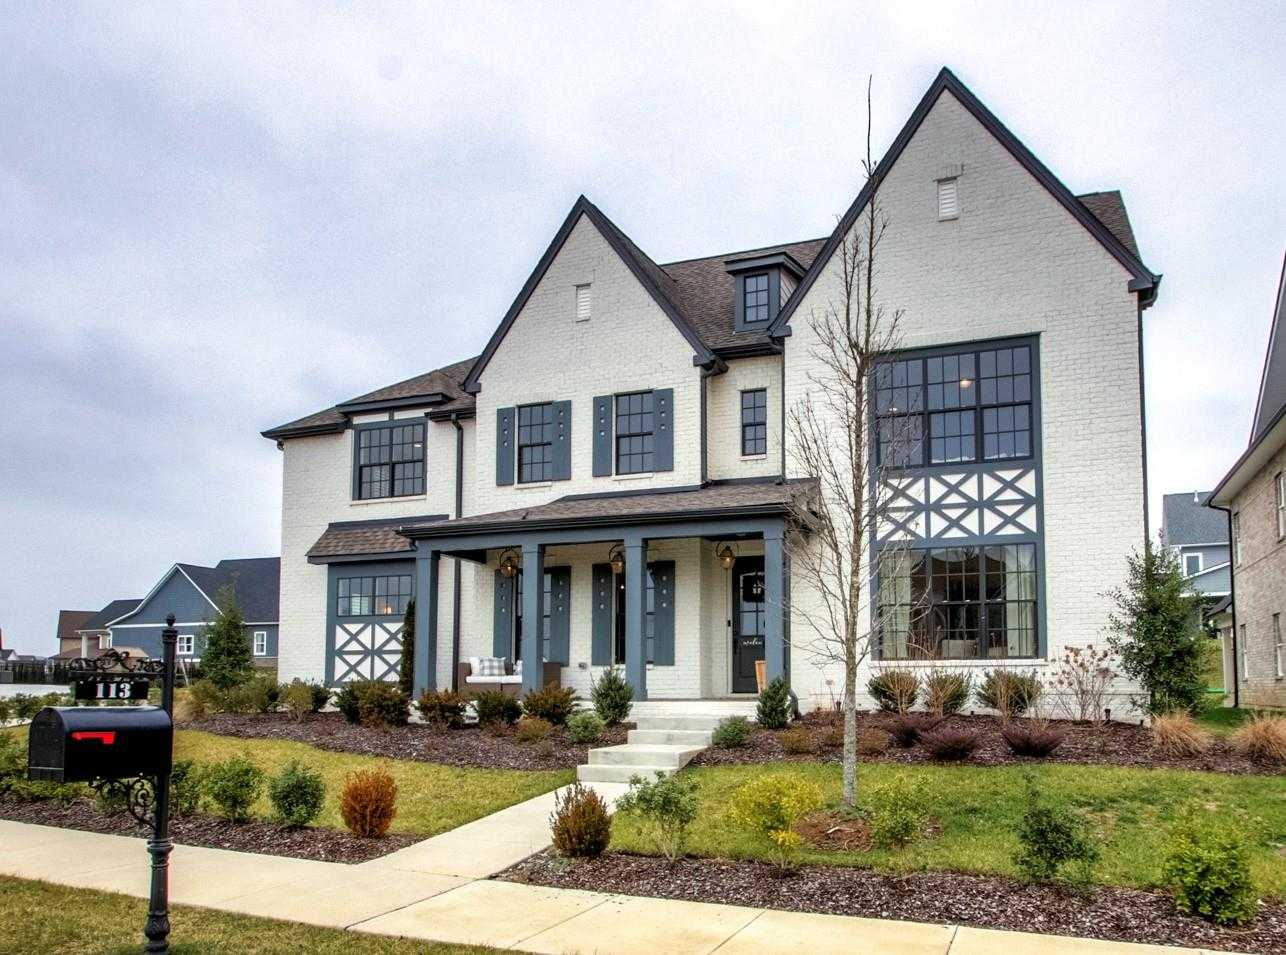 $679,900 - 5Br/4Ba -  for Sale in Jackson Hills Ph1 Sec1c, Mount Juliet